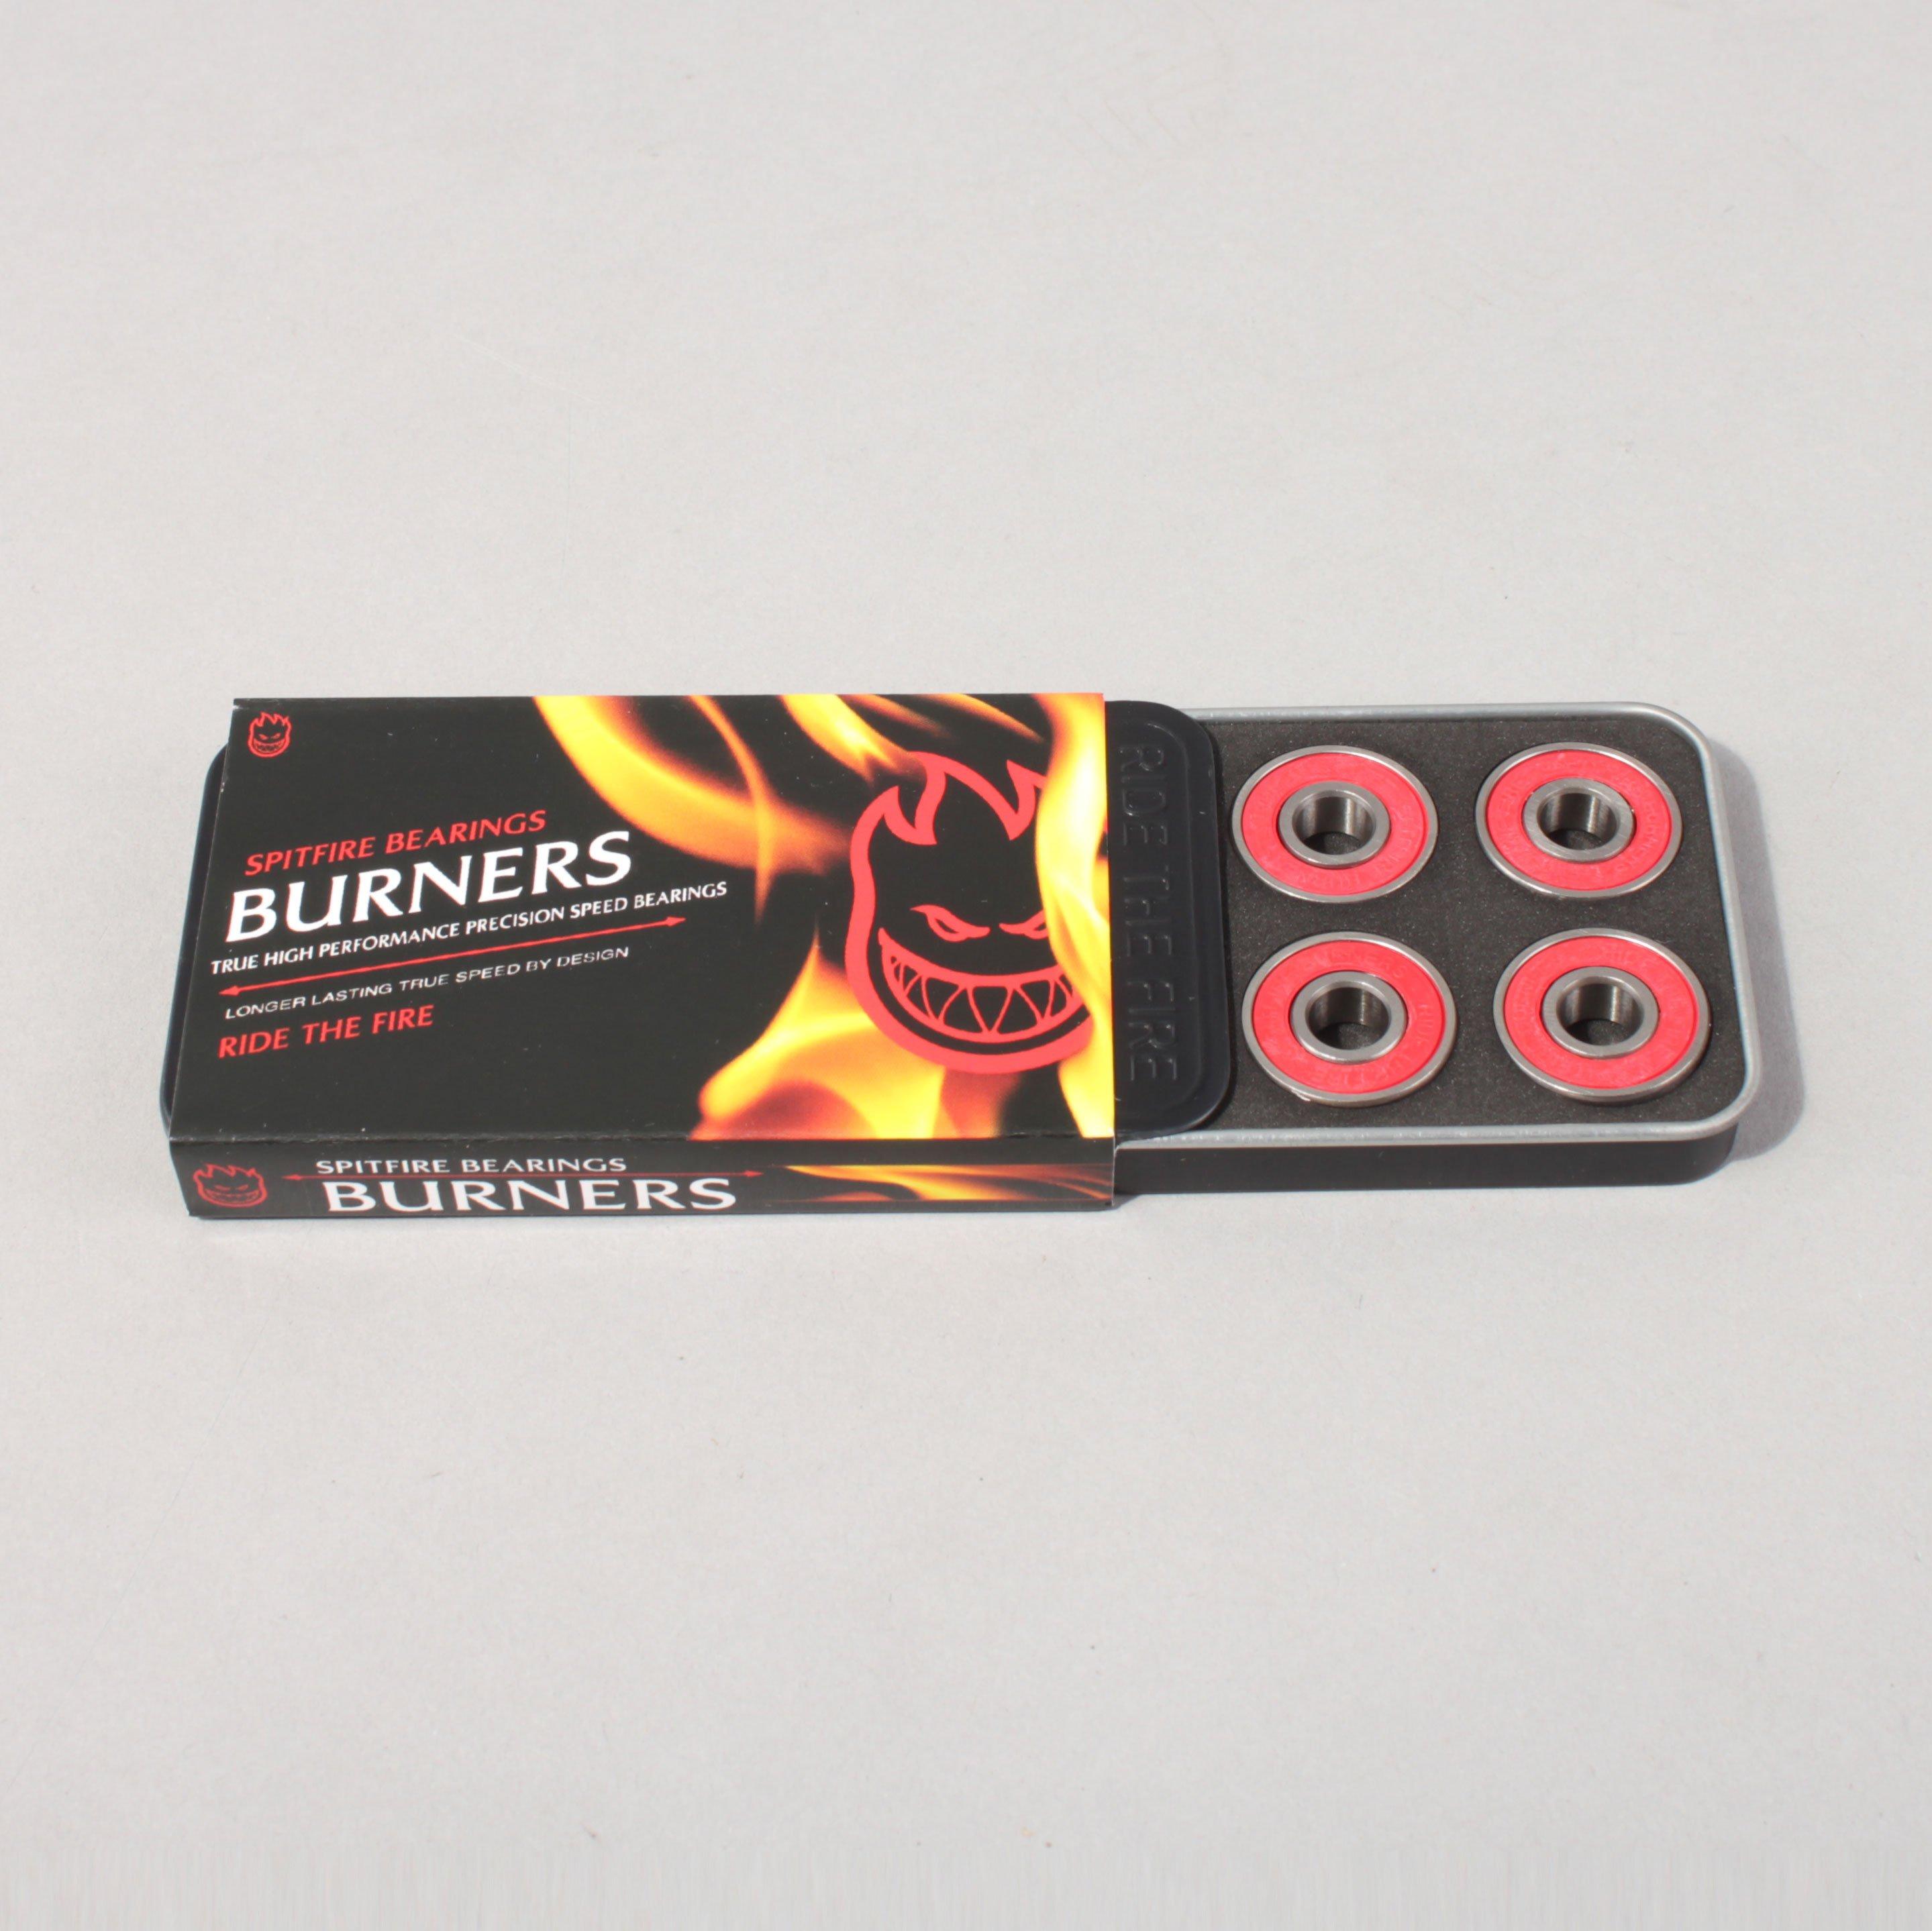 Spitfire Burners Bearings ABEC7